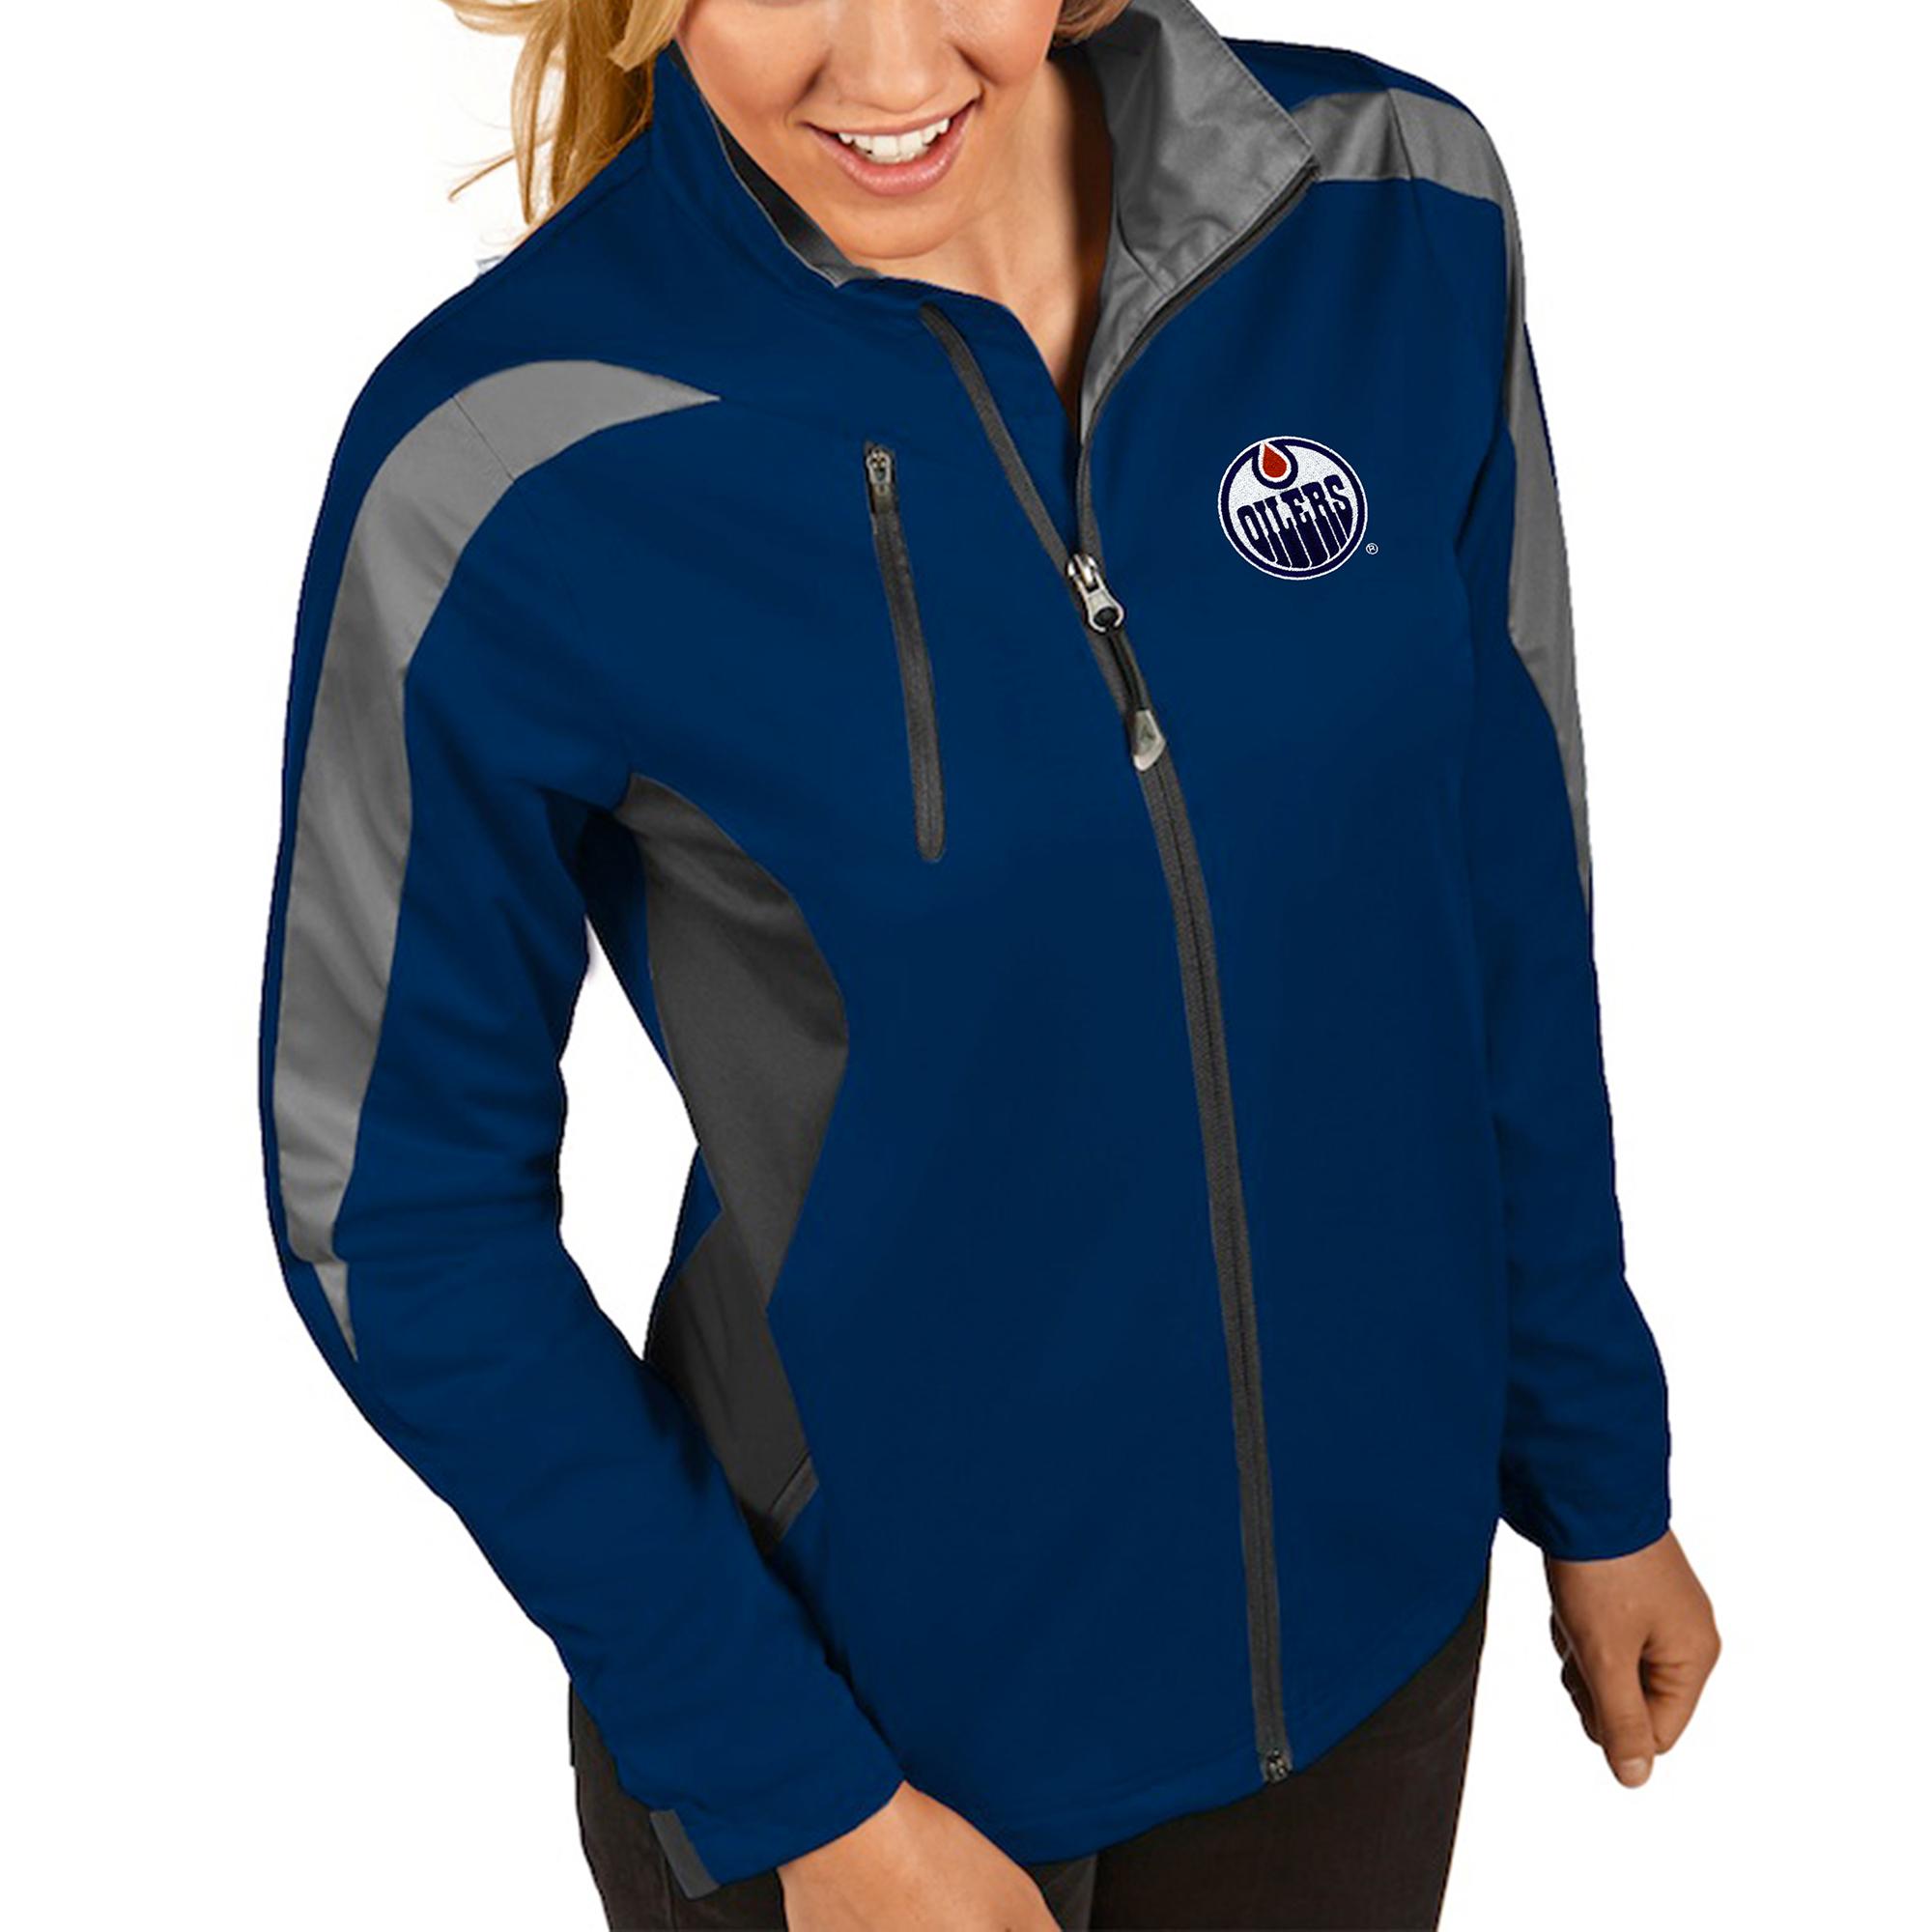 Edmonton Oilers Antigua Women's Discover Performance Full-Zip Jacket - Navy